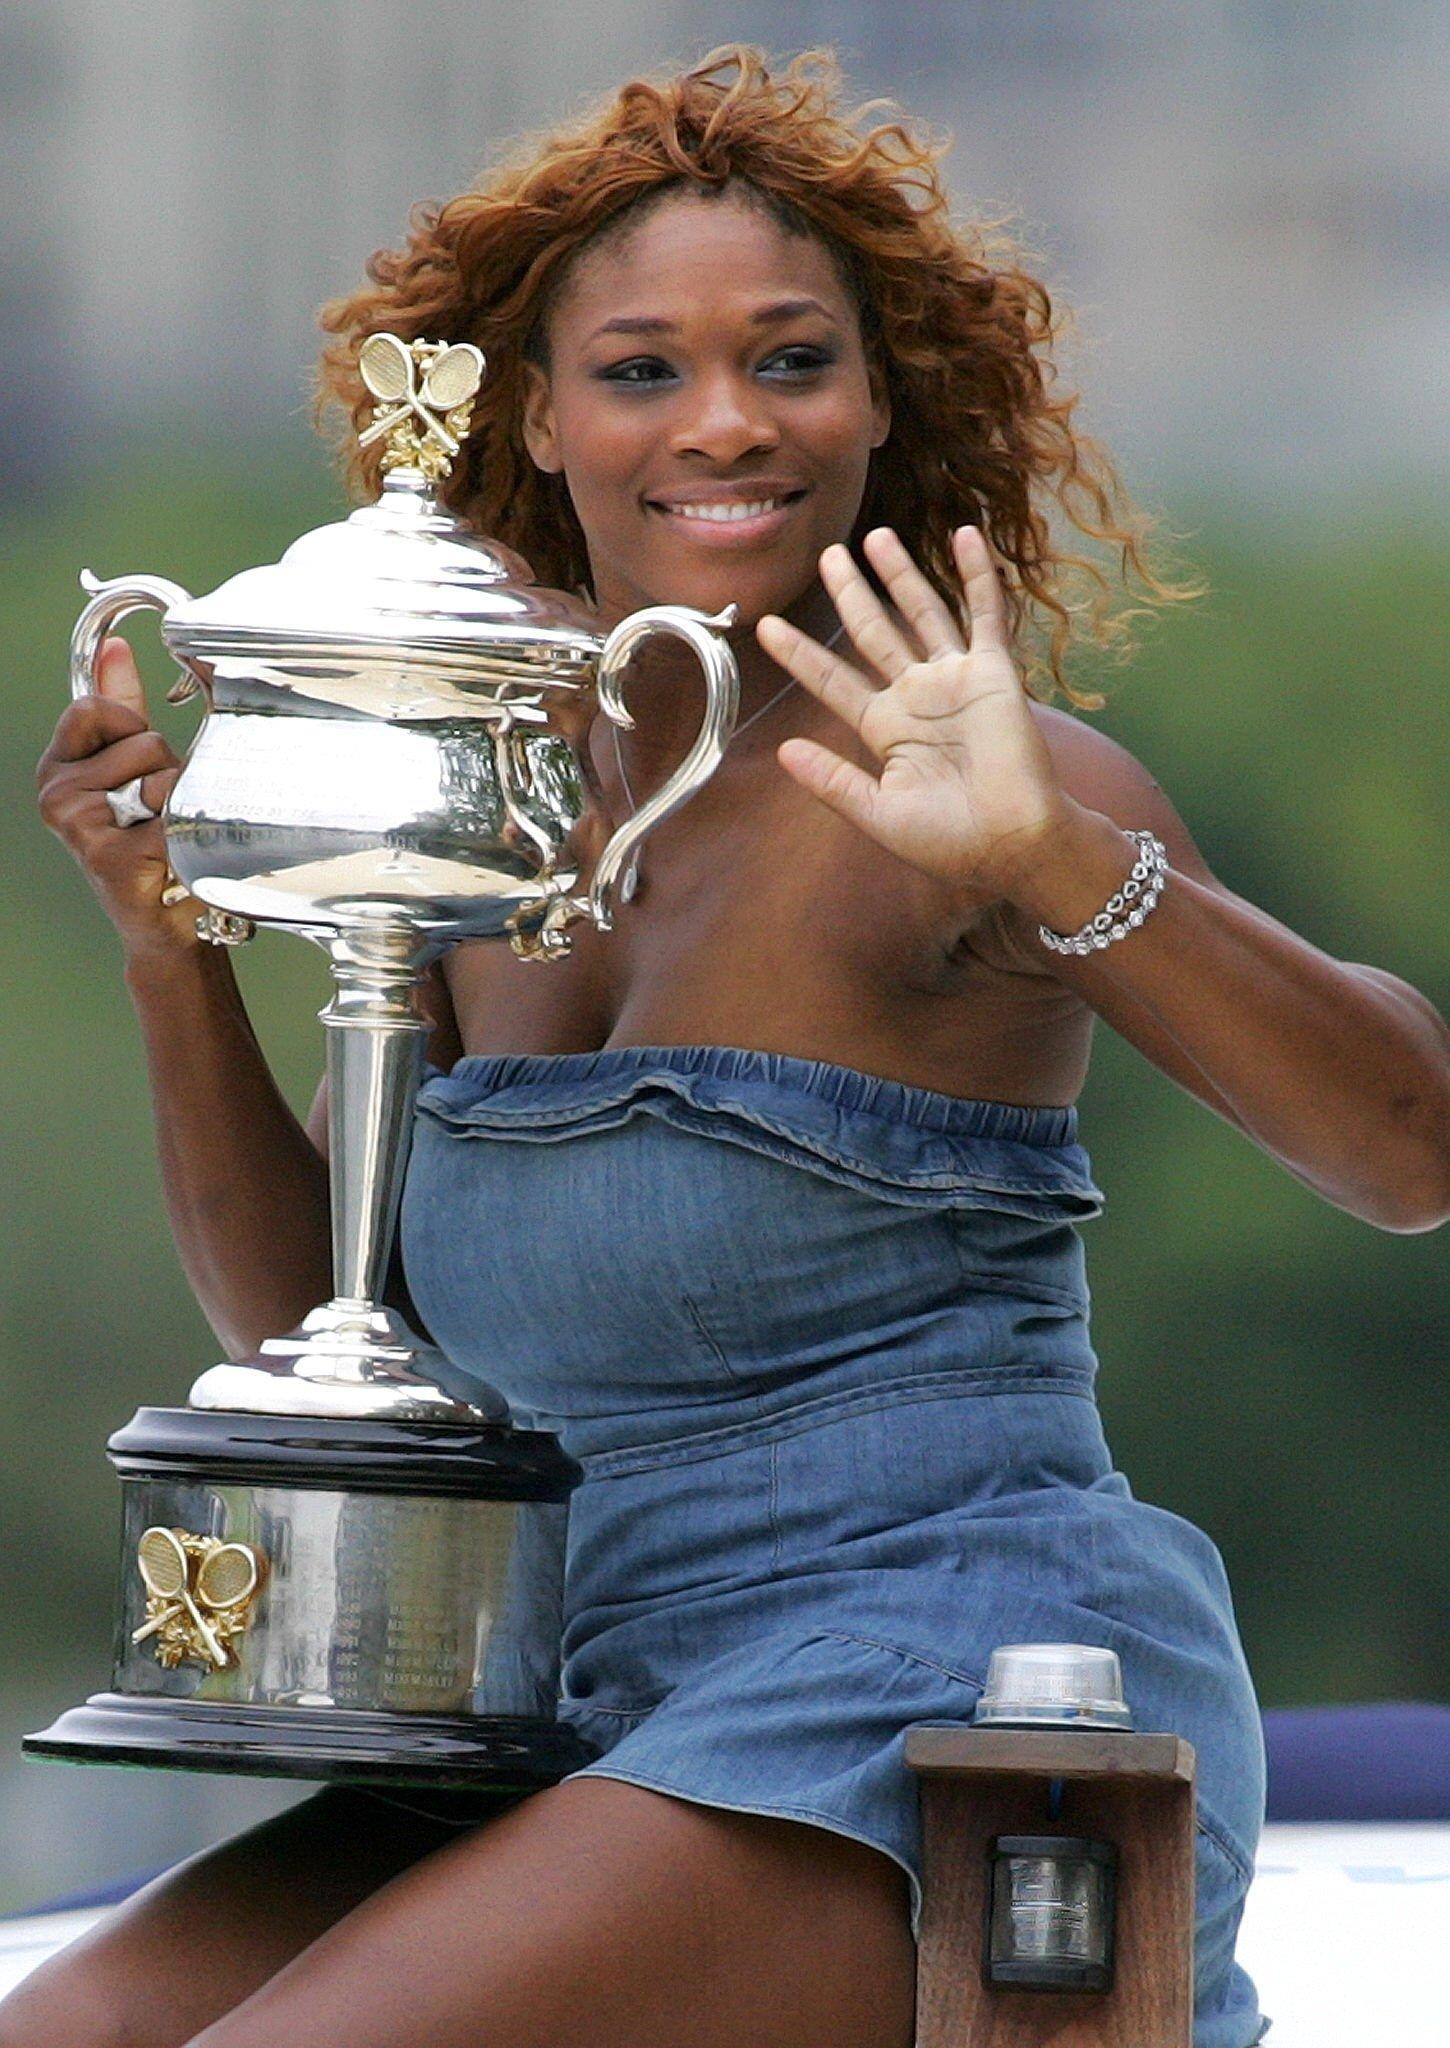 Serena Williams has now won 23 Grand Slam titles, a truly phenomenal achievement